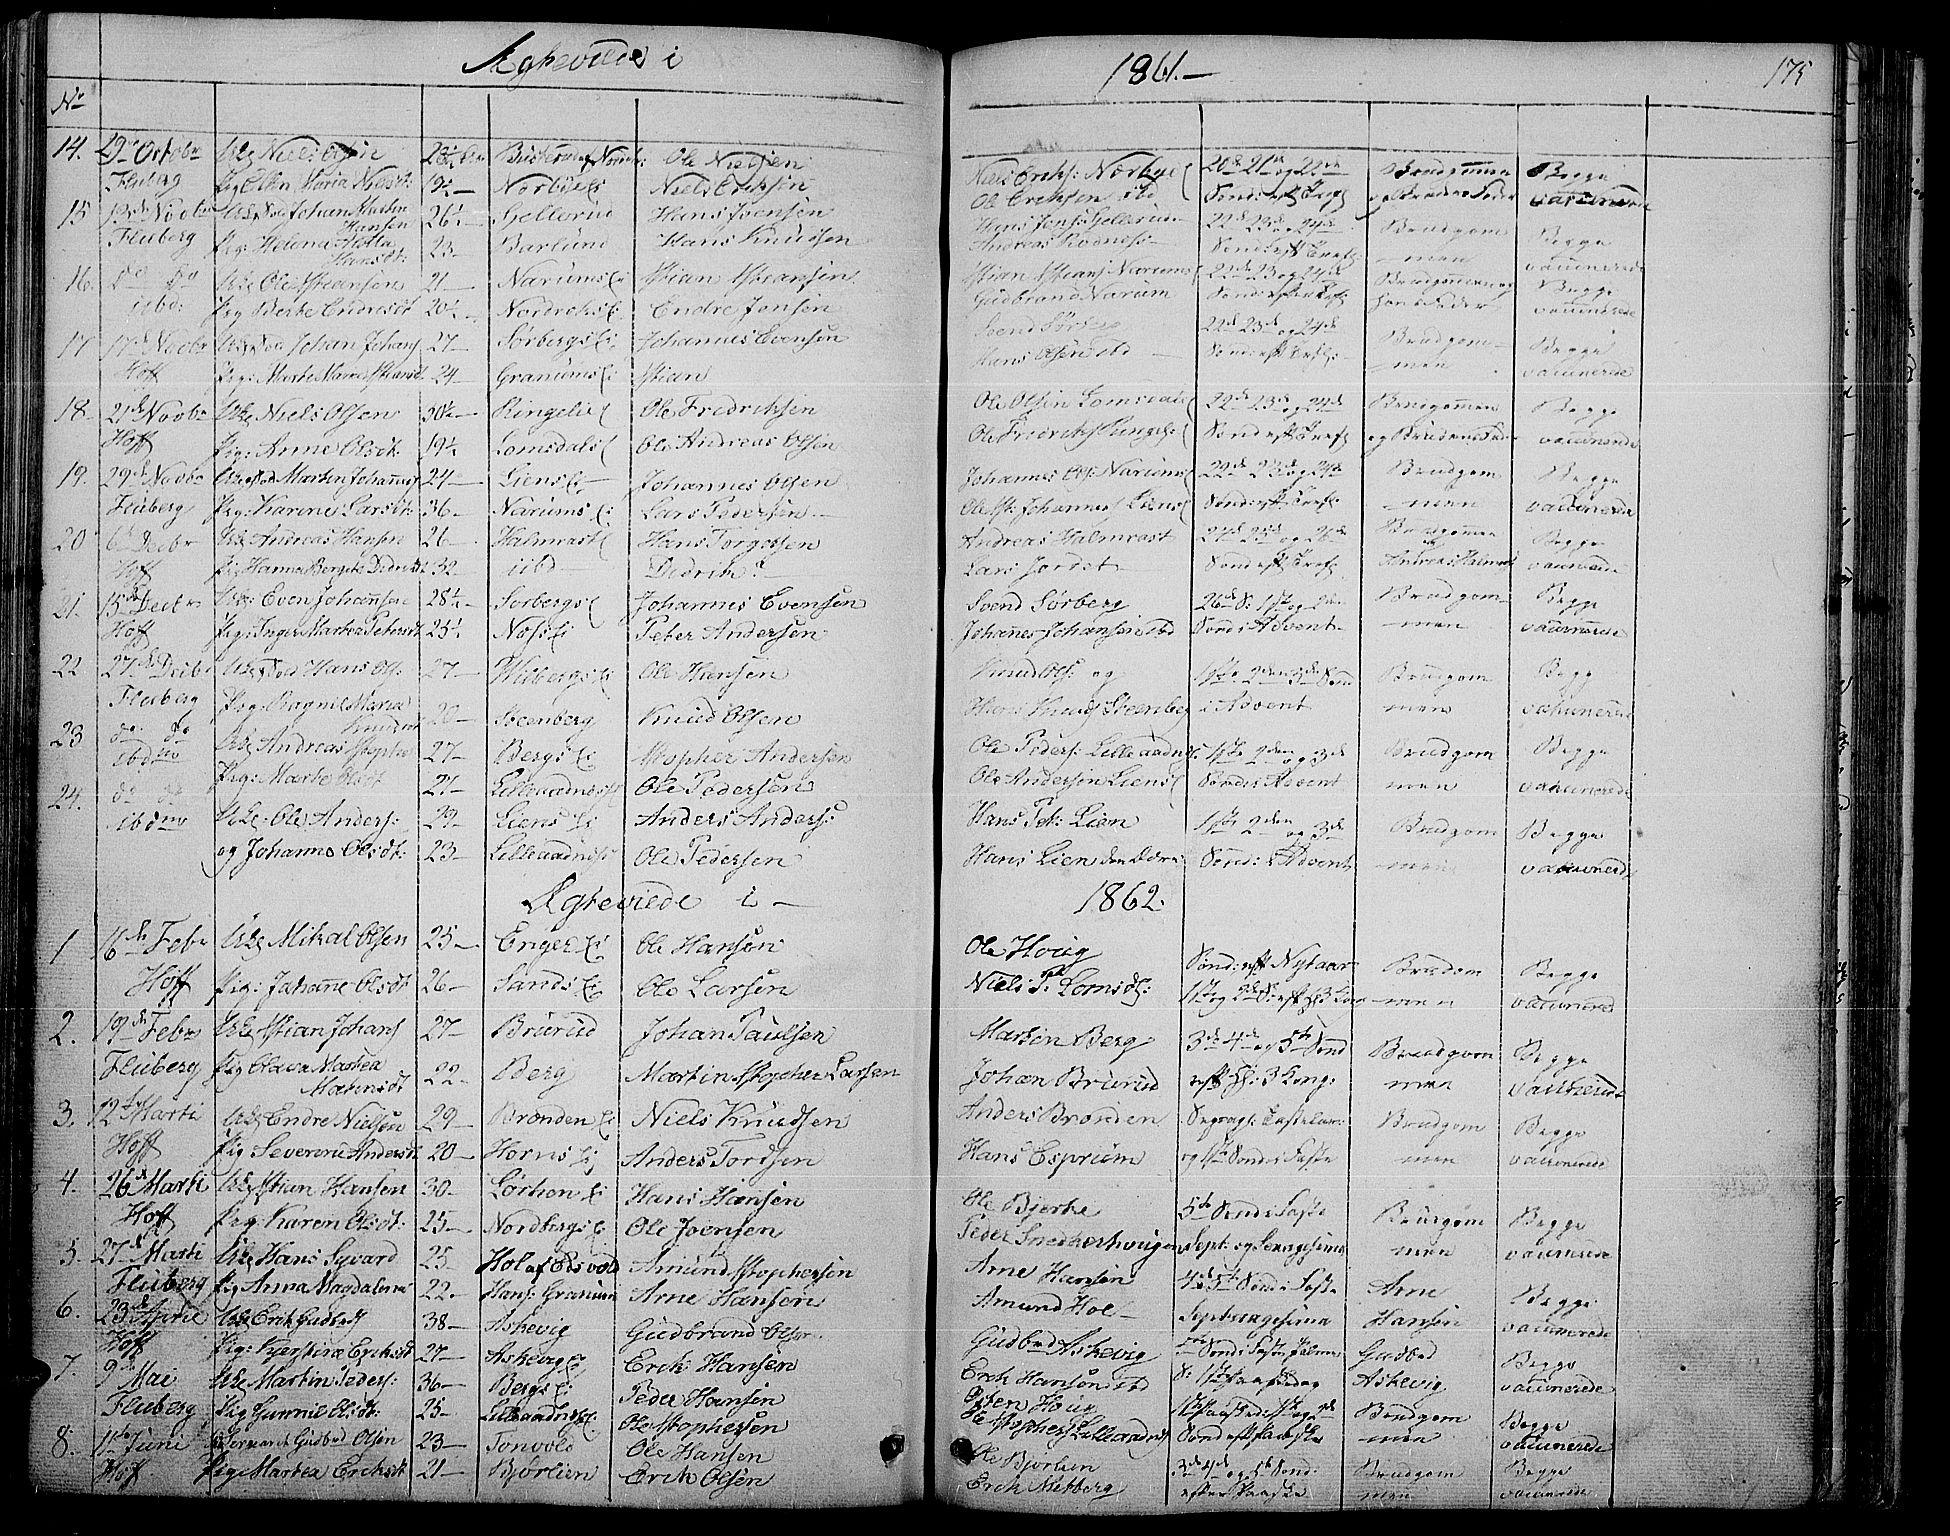 SAH, Søndre Land prestekontor, L/L0001: Klokkerbok nr. 1, 1849-1883, s. 175